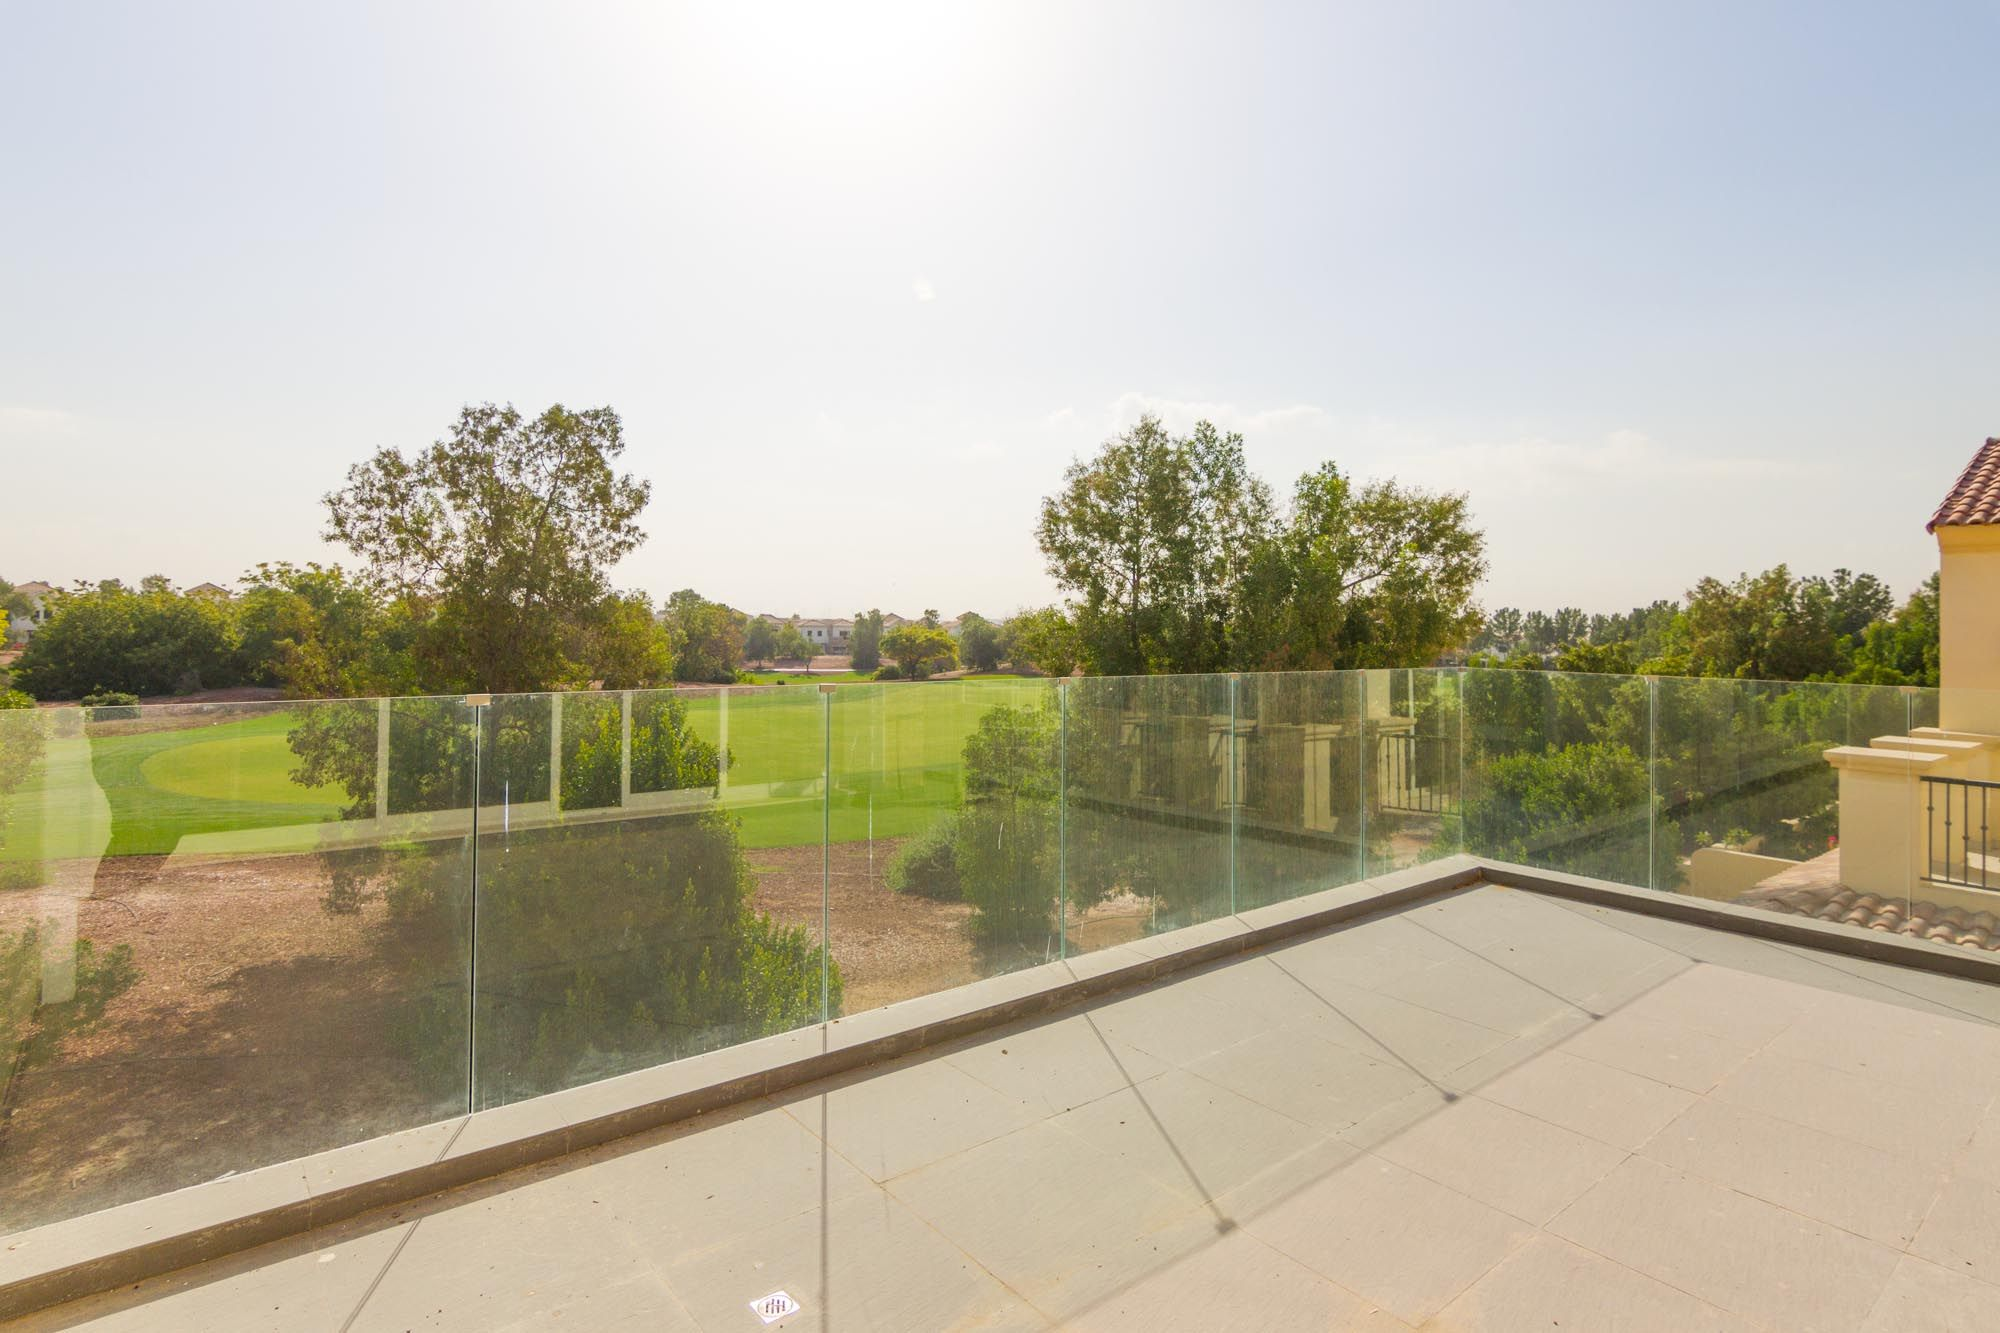 5 Bedroom Luxury Villa in Jumeirah Golf Estates